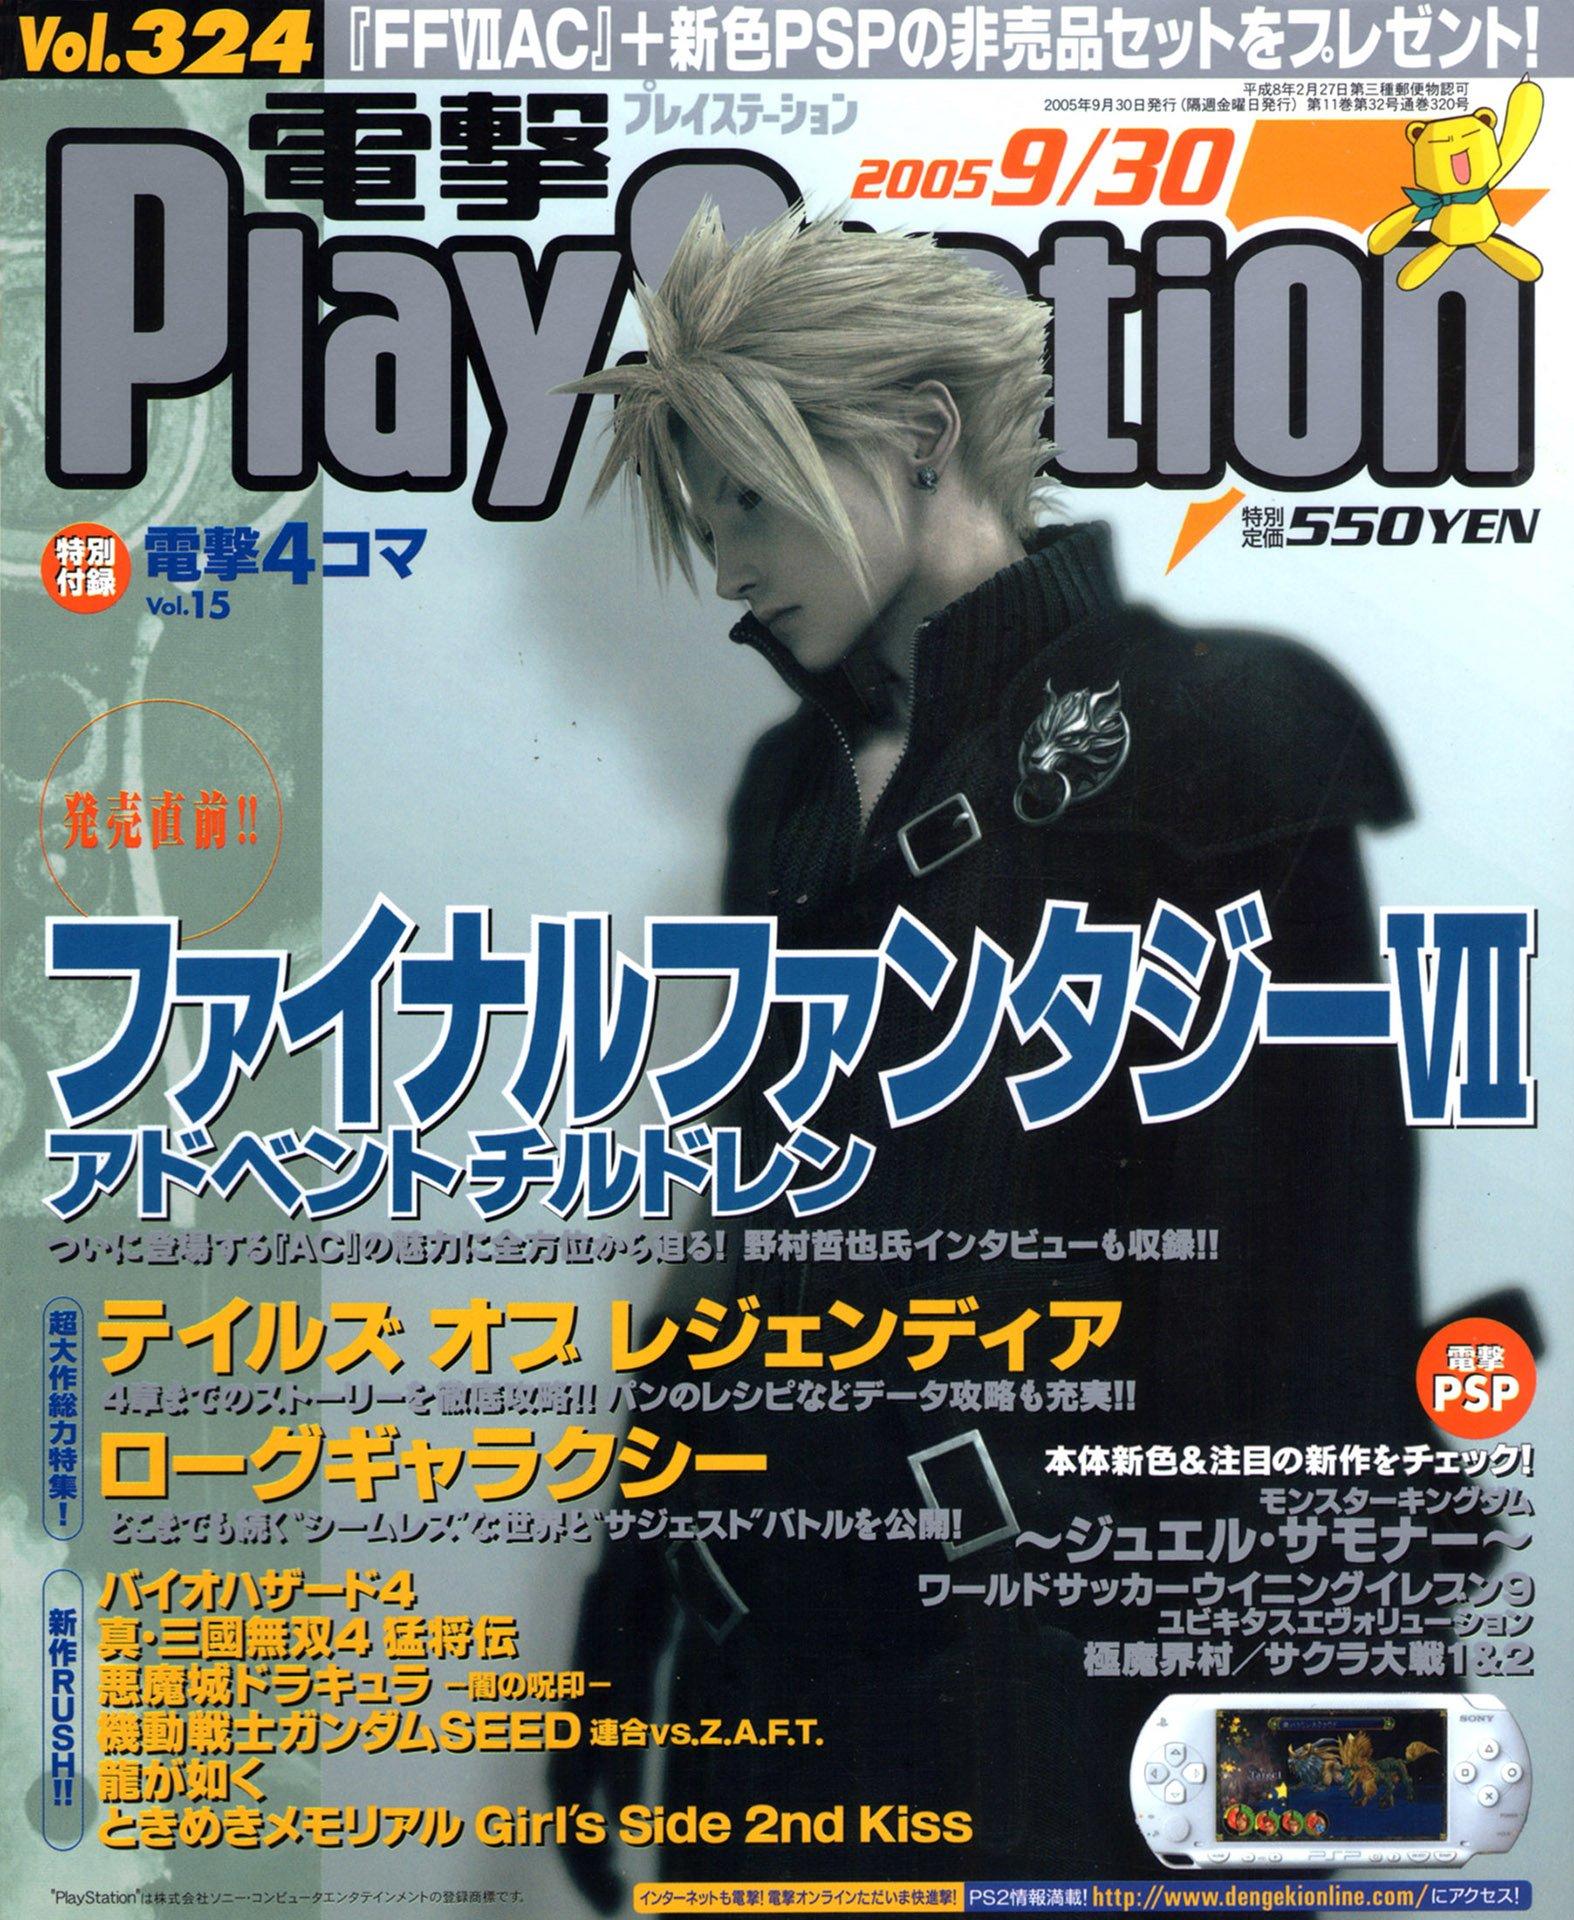 Dengeki PlayStation 324 (September 30, 2005)